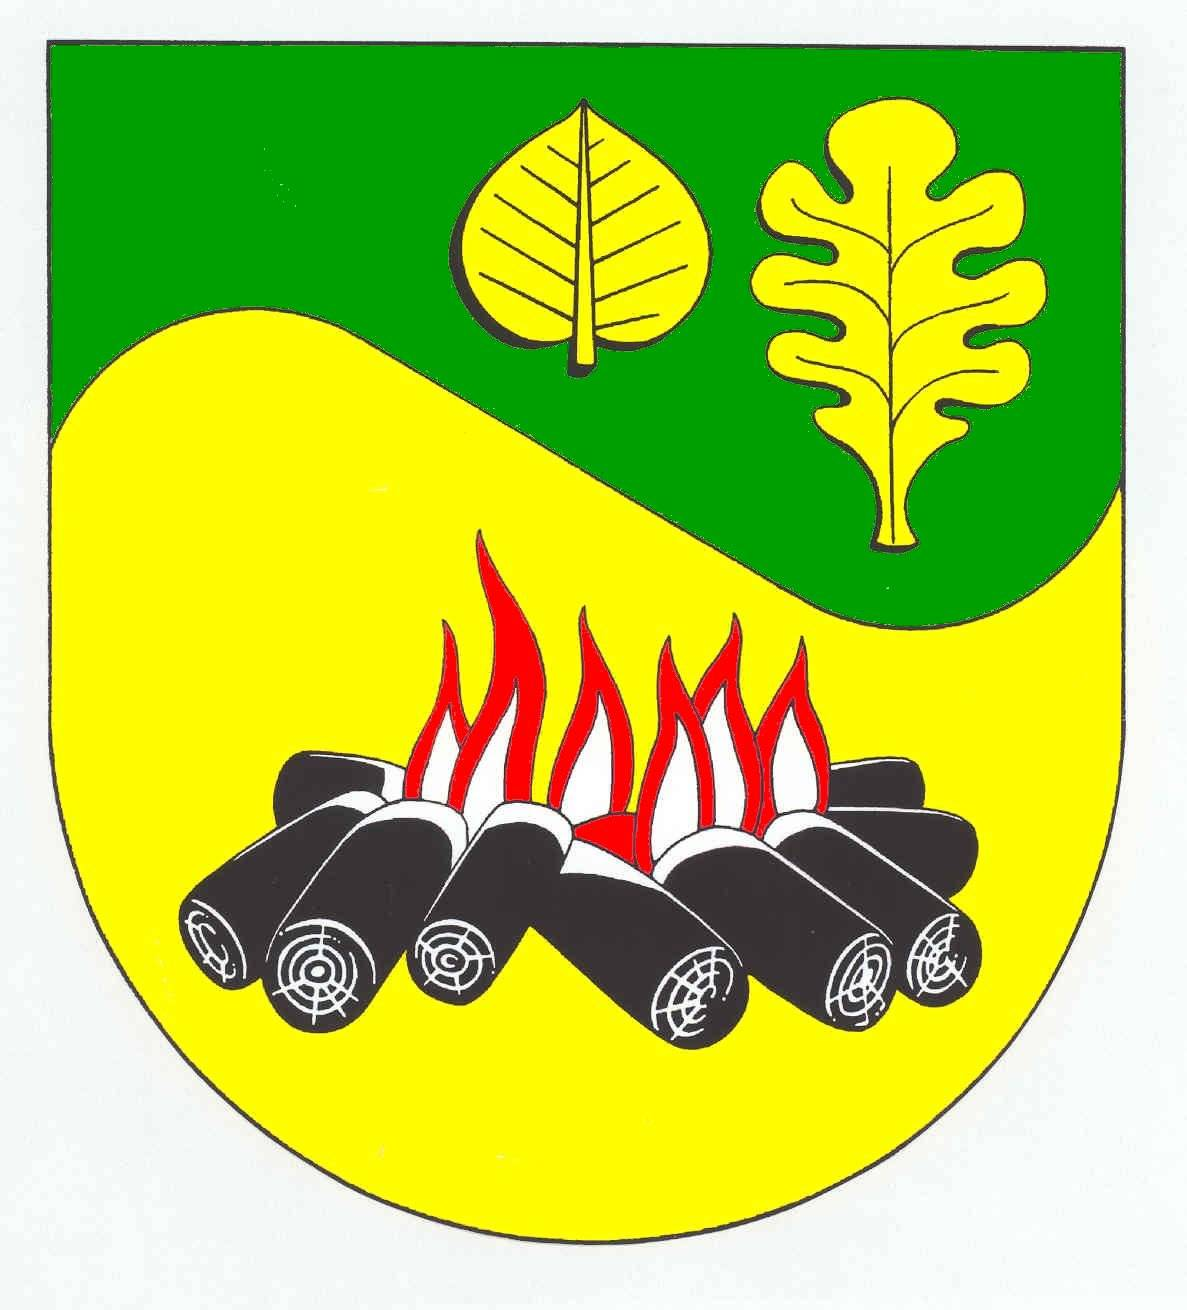 Wappen GemeindeGrauel, Kreis Rendsburg-Eckernförde